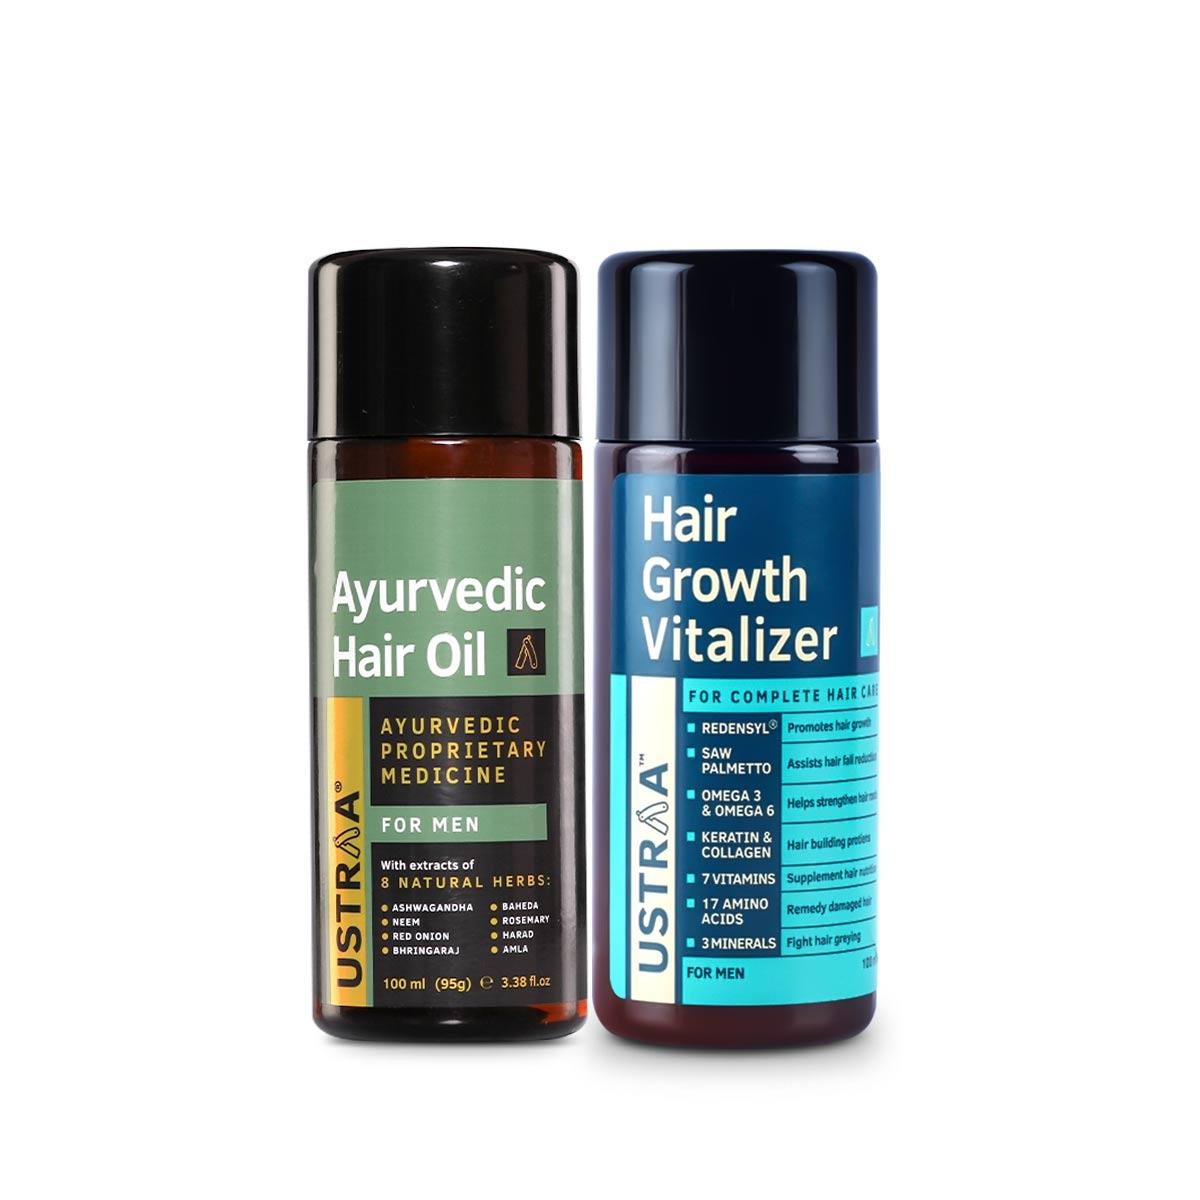 Ustraa Ultimate Hair Care Kit For Men (Set of 2): Hair Growth Vitalizer and Ayurvedic Hair Oil